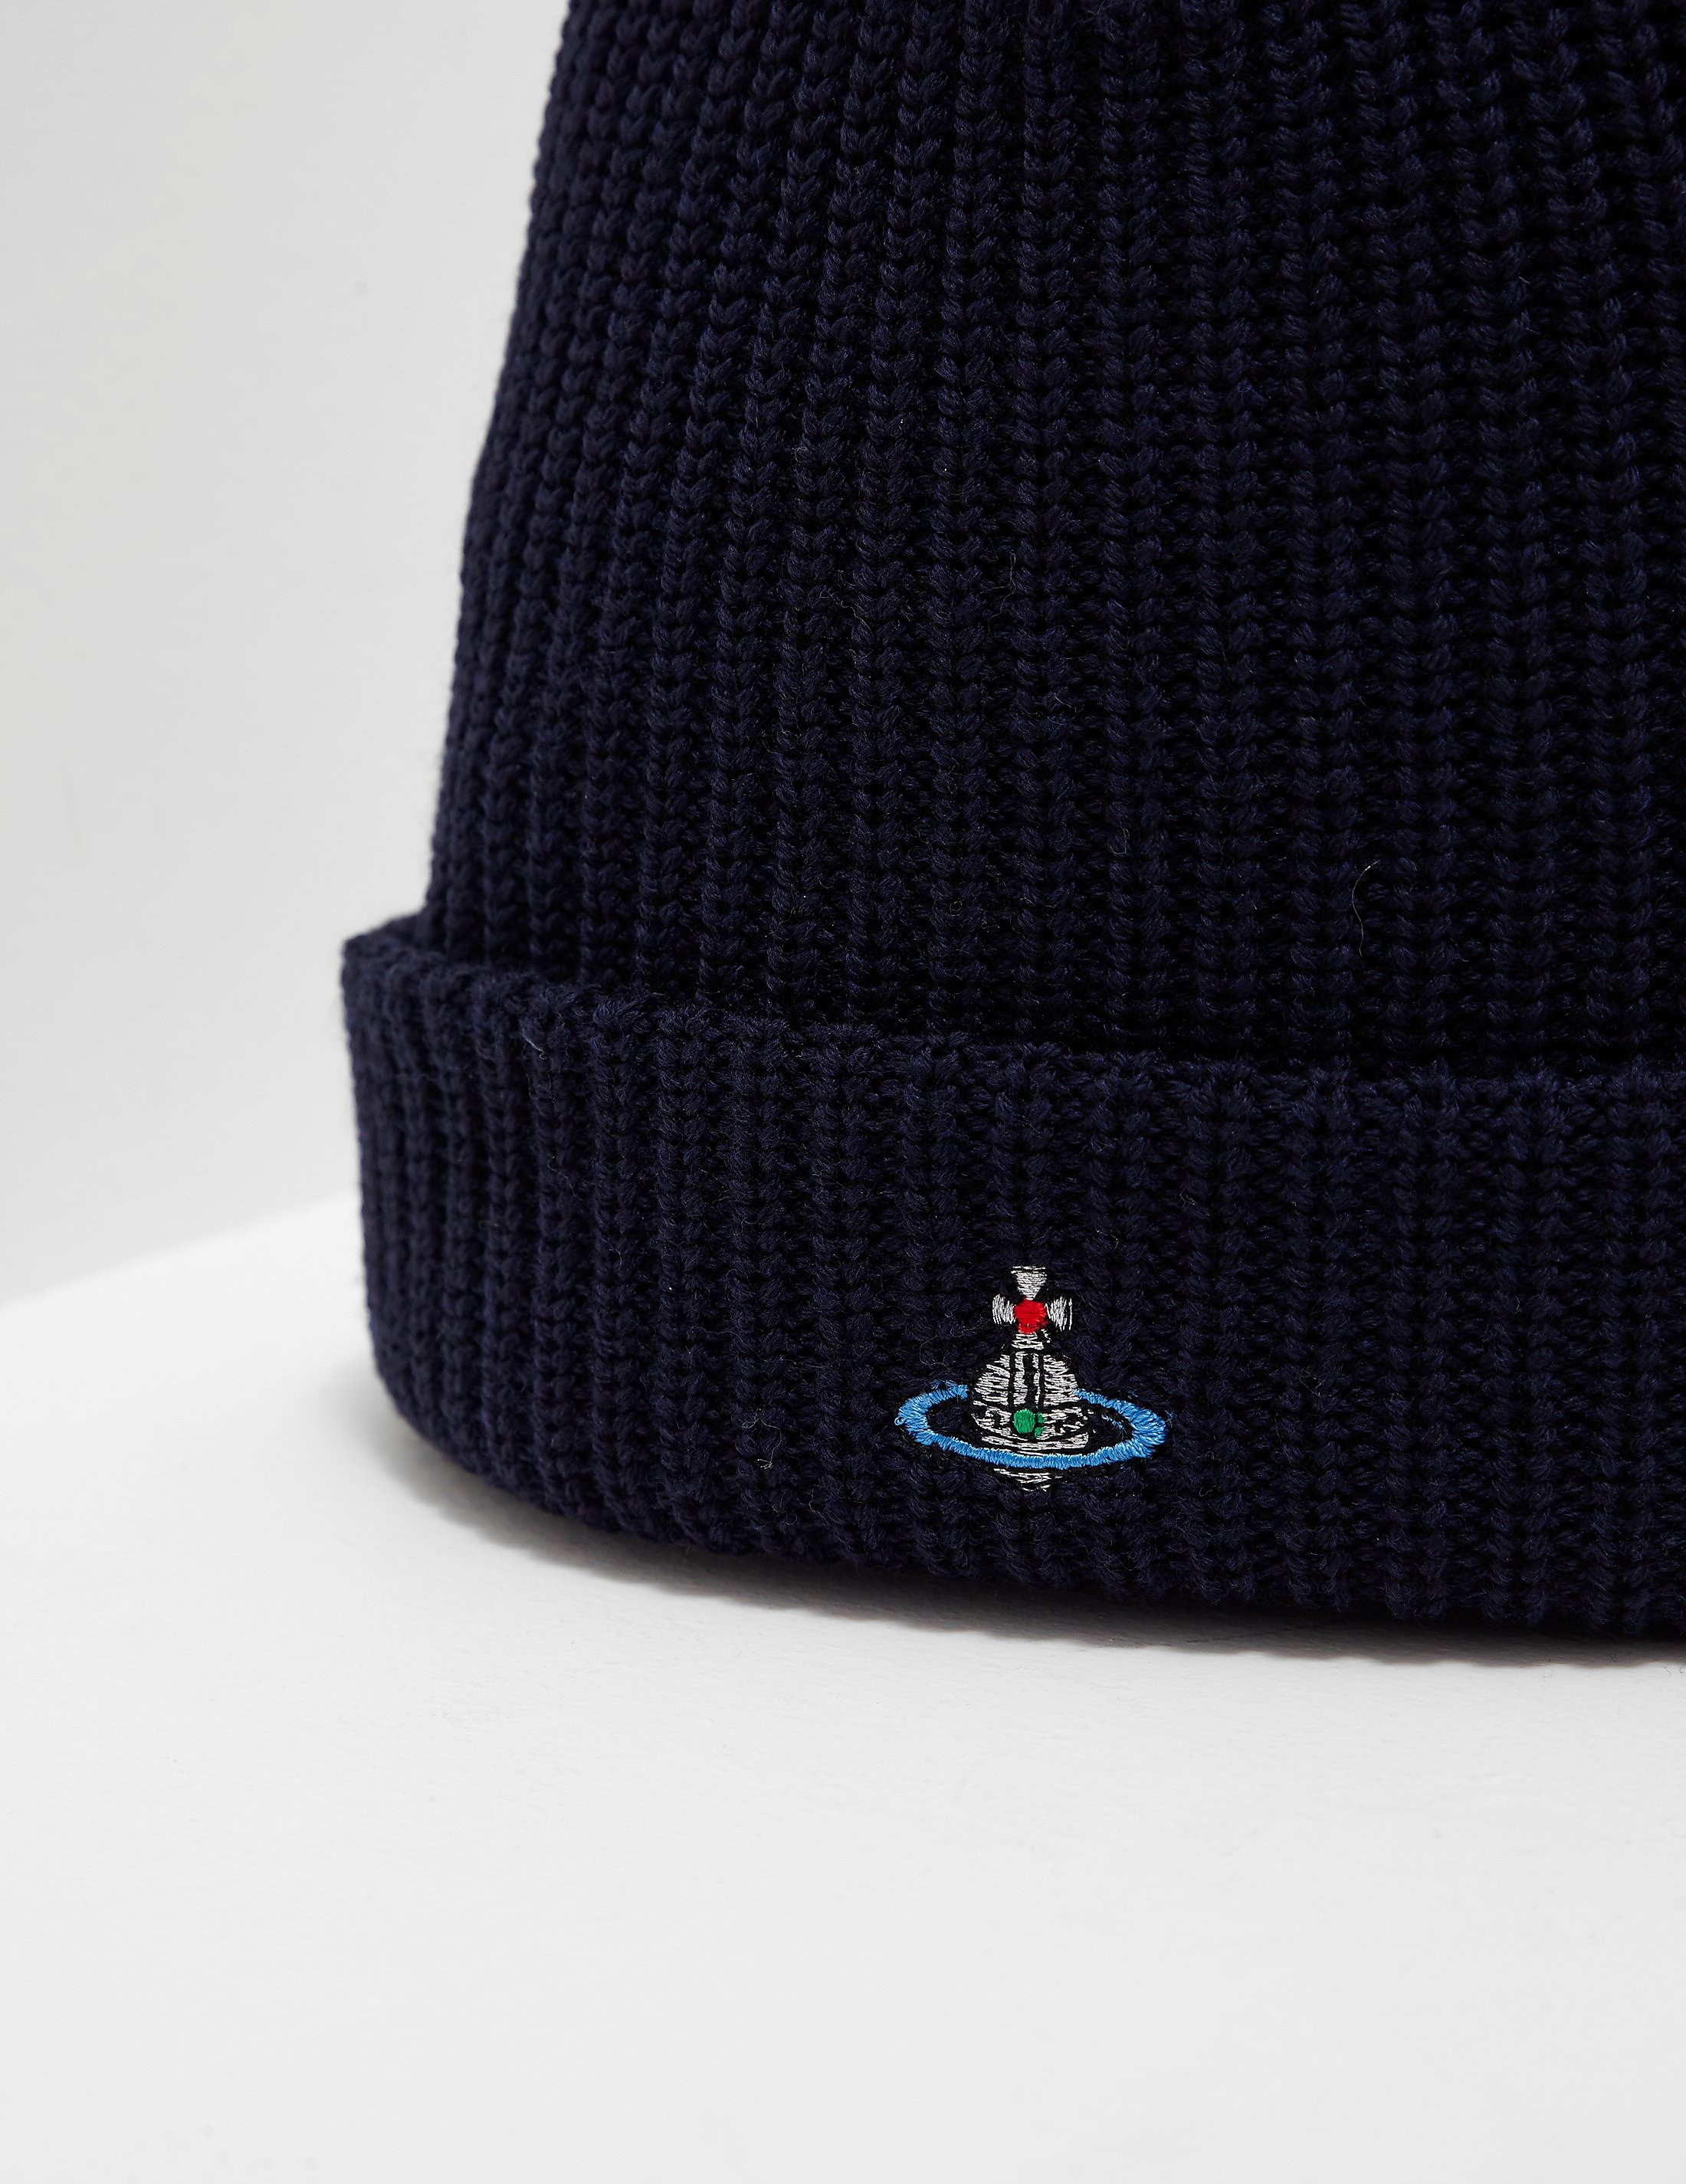 Vivienne Westwood Orb Knitted Beanie